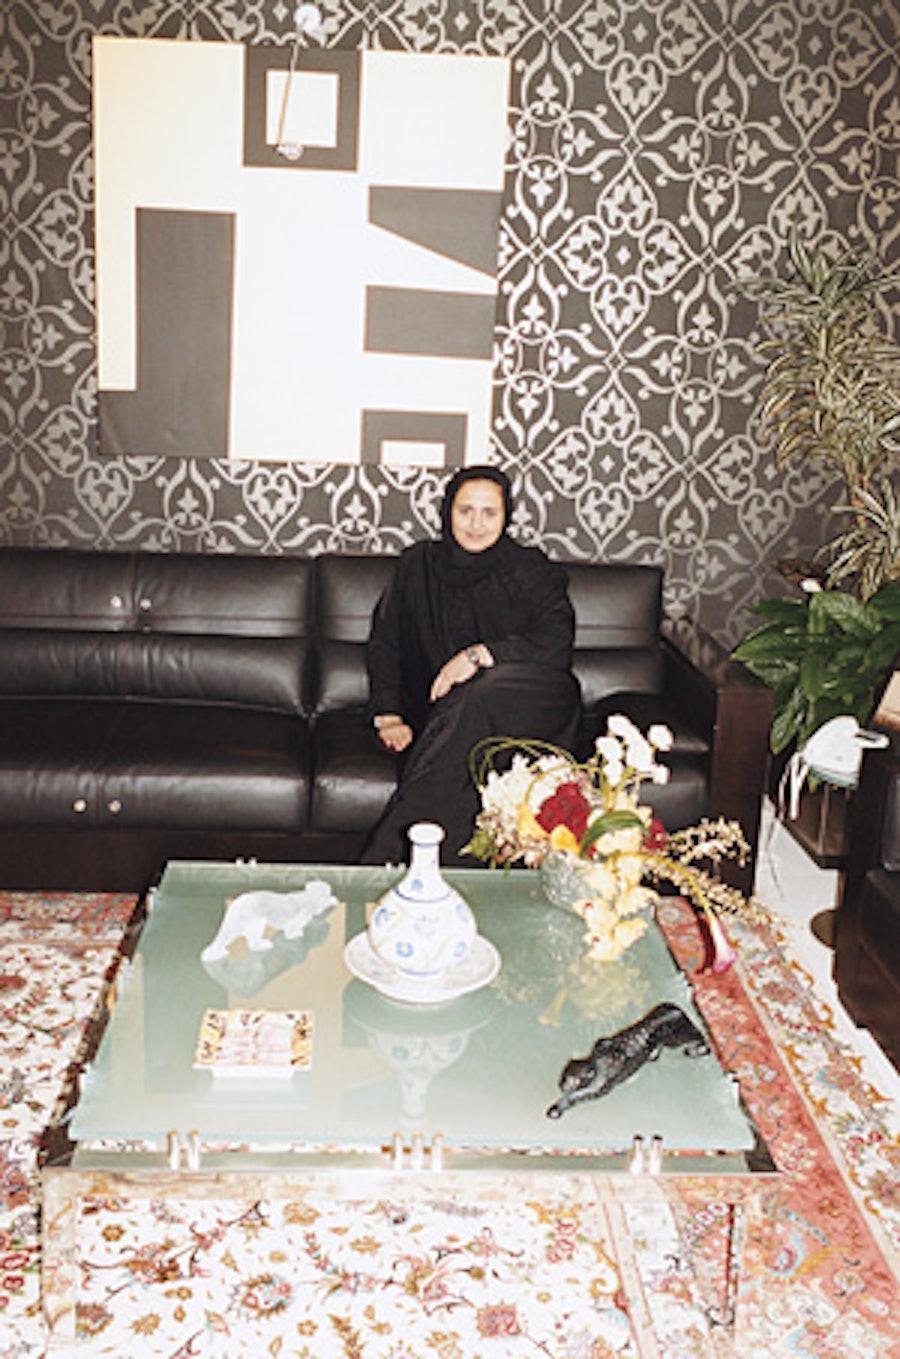 trar_qatar_01_v.jpg